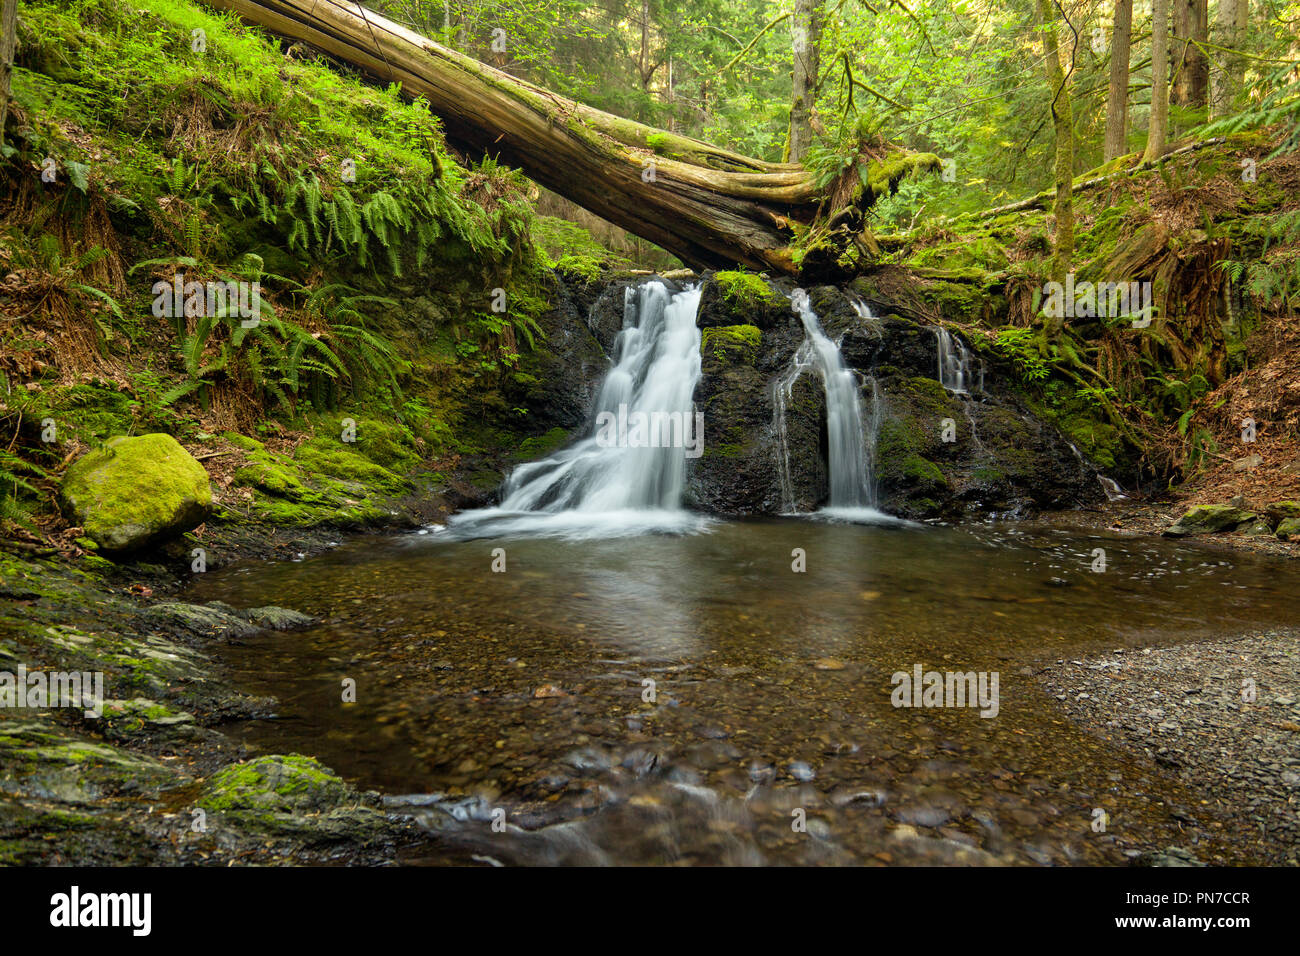 Rustic Falls on Orcas Island in the San Juan Islands, Washington state Stock Photo